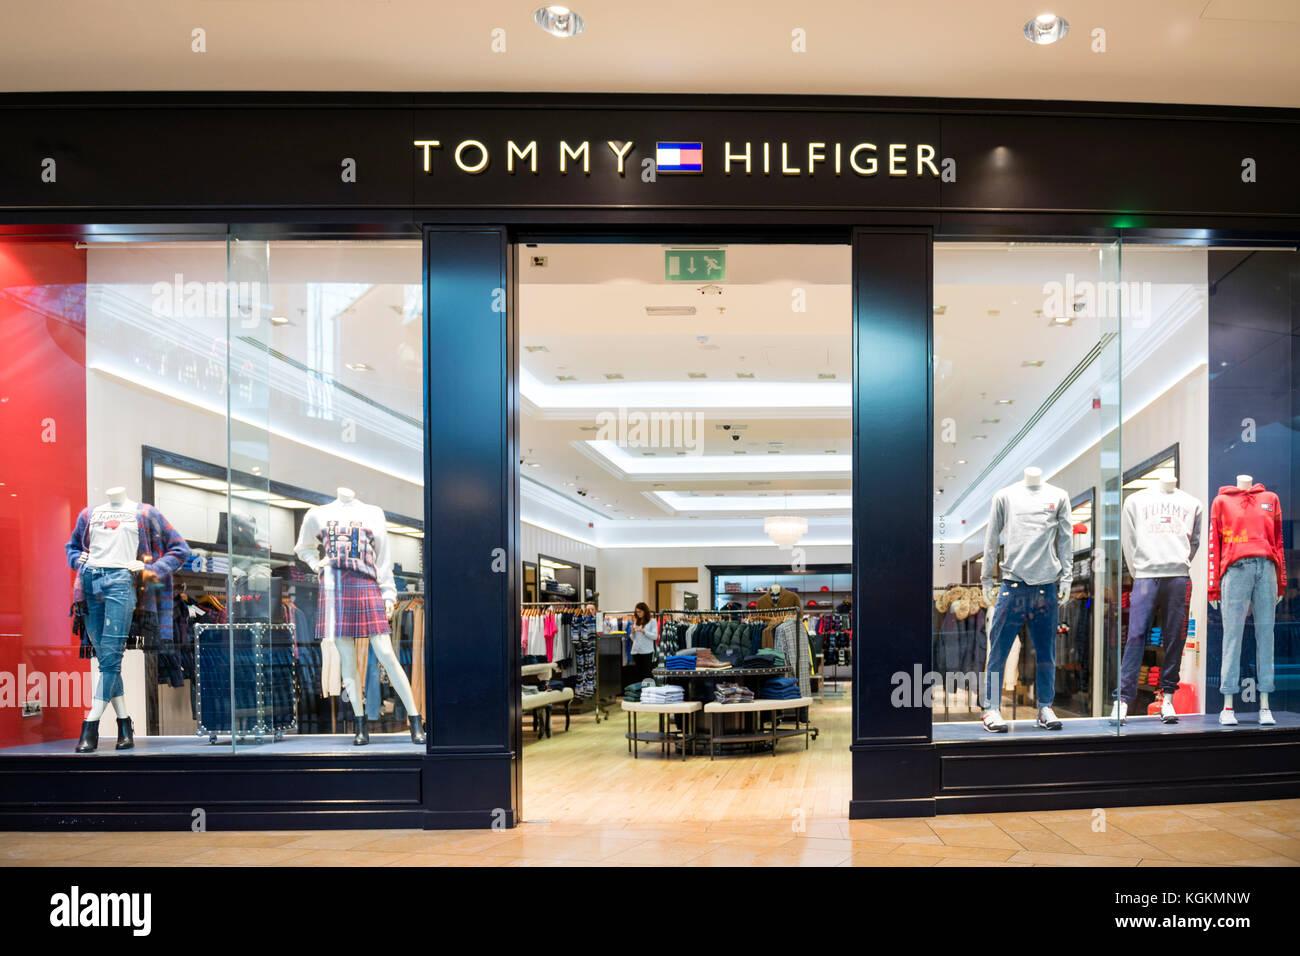 33a8cbc4 Tommy Hilfiger store, UK Stock Photo: 165161189 - Alamy